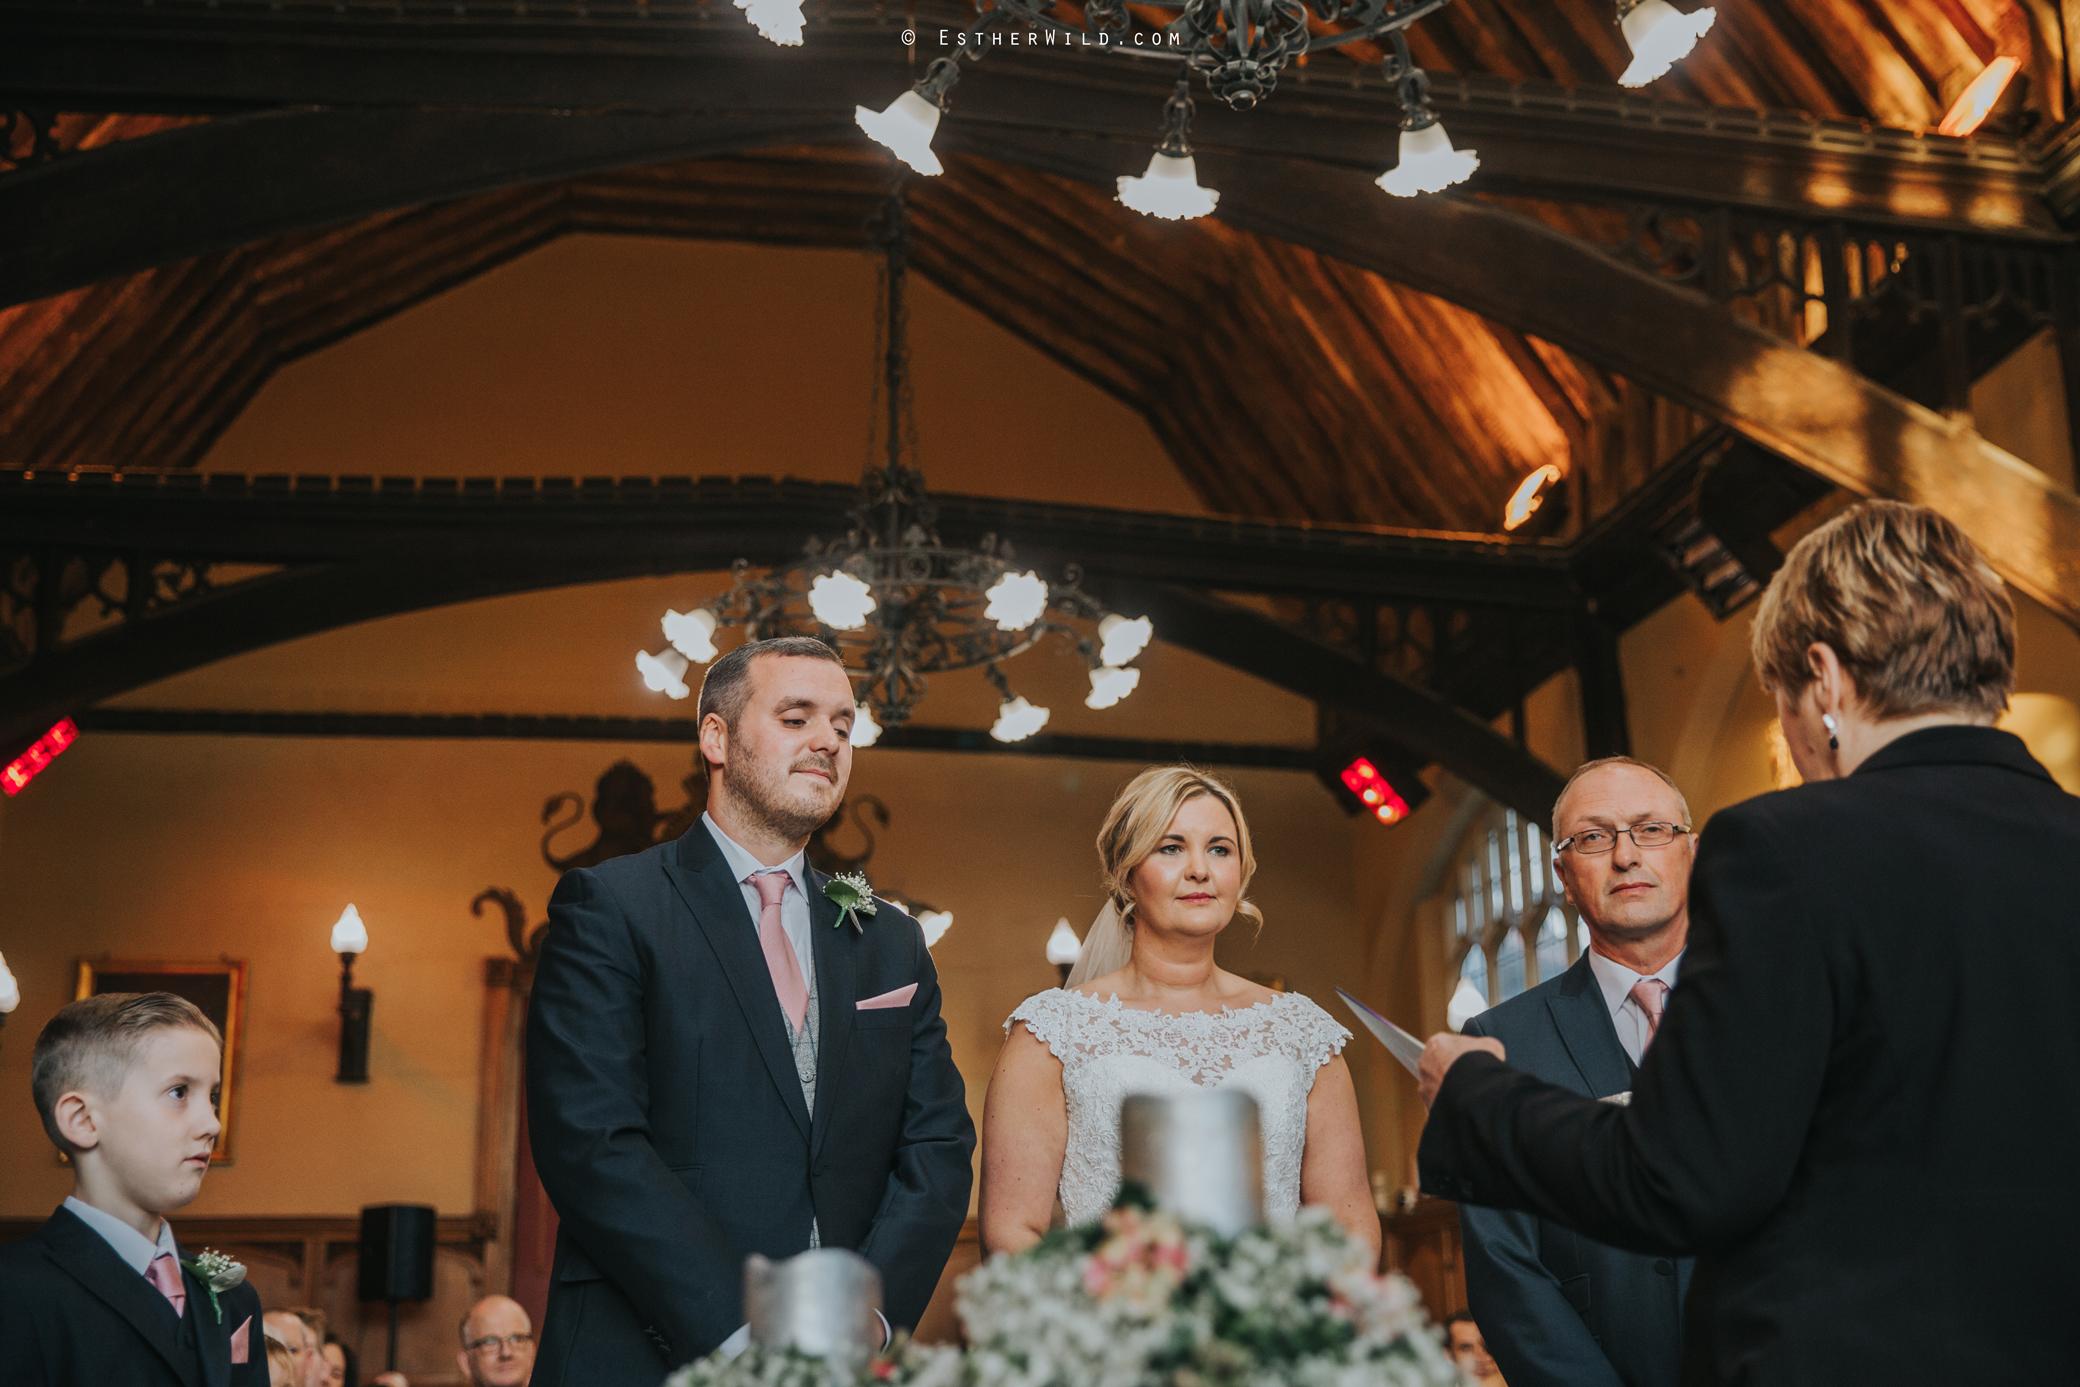 Wedding_Kings_Lynn_Town_Hall_Norfolk_Photographer_Esther_Wild_IMG_0953.jpg